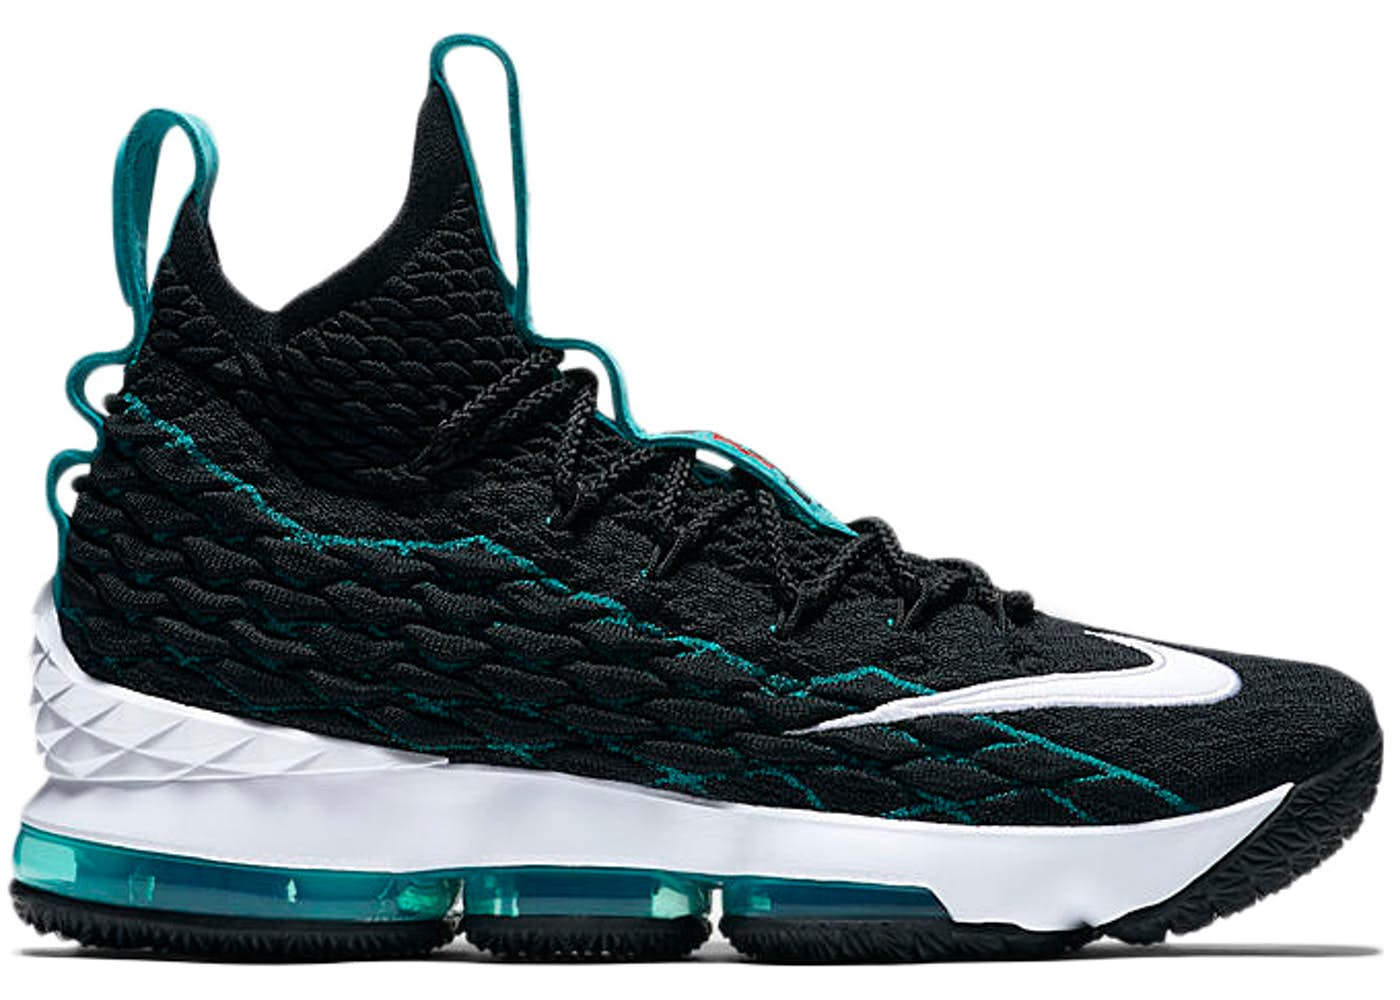 Nike LeBron 15 Griffey